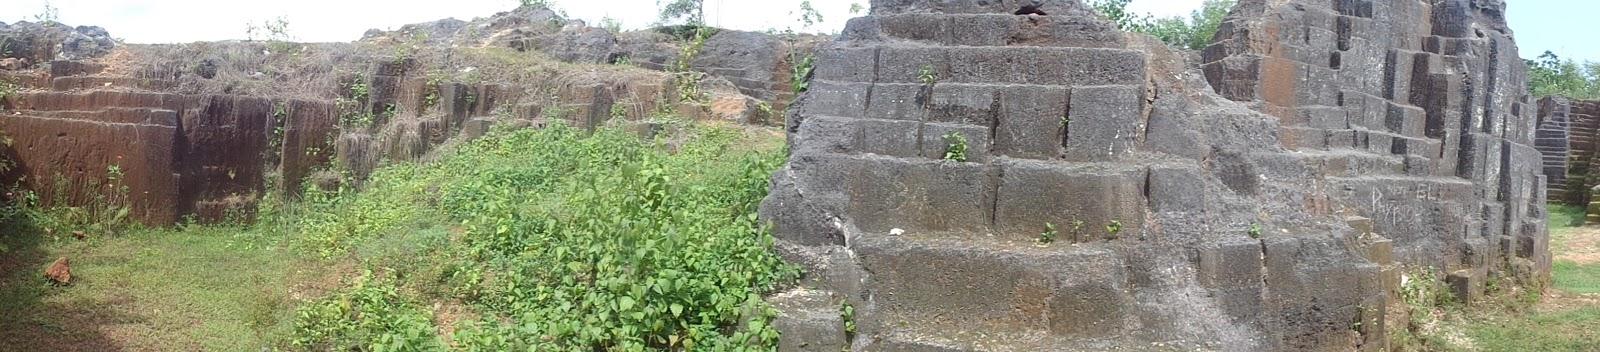 Wisata Watu Giring Yogyakarta Tempat Foto Pre Wedding Selfie Jalan